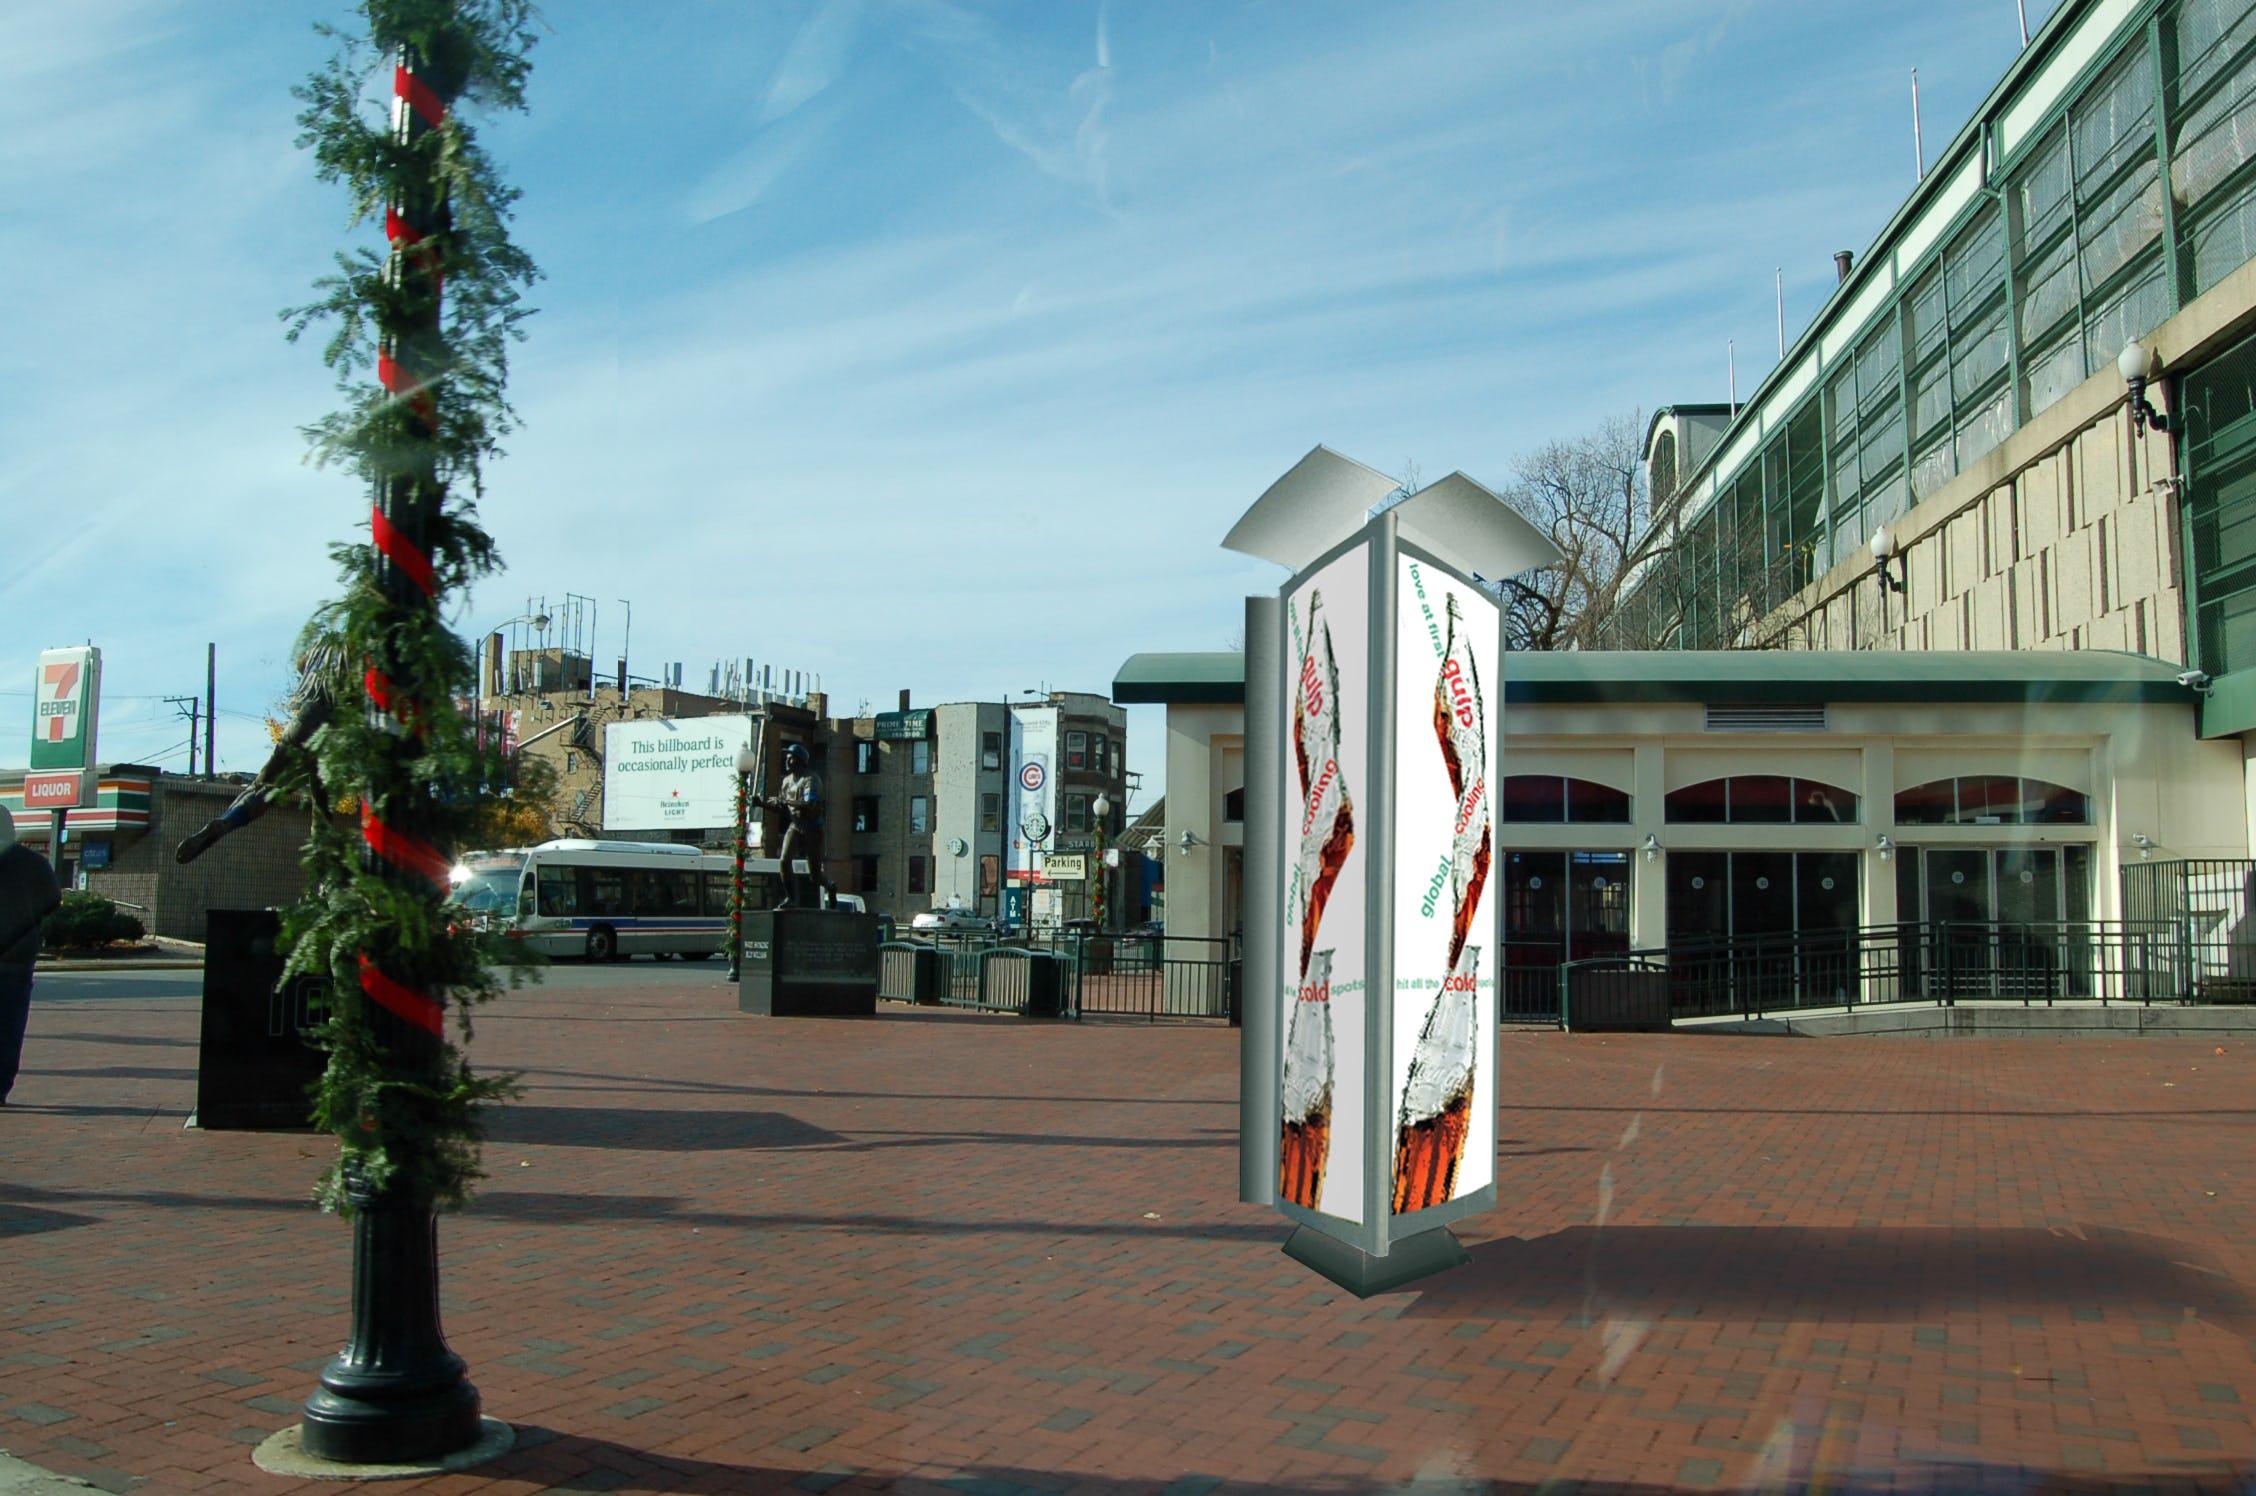 Plaza pinwheel day copy